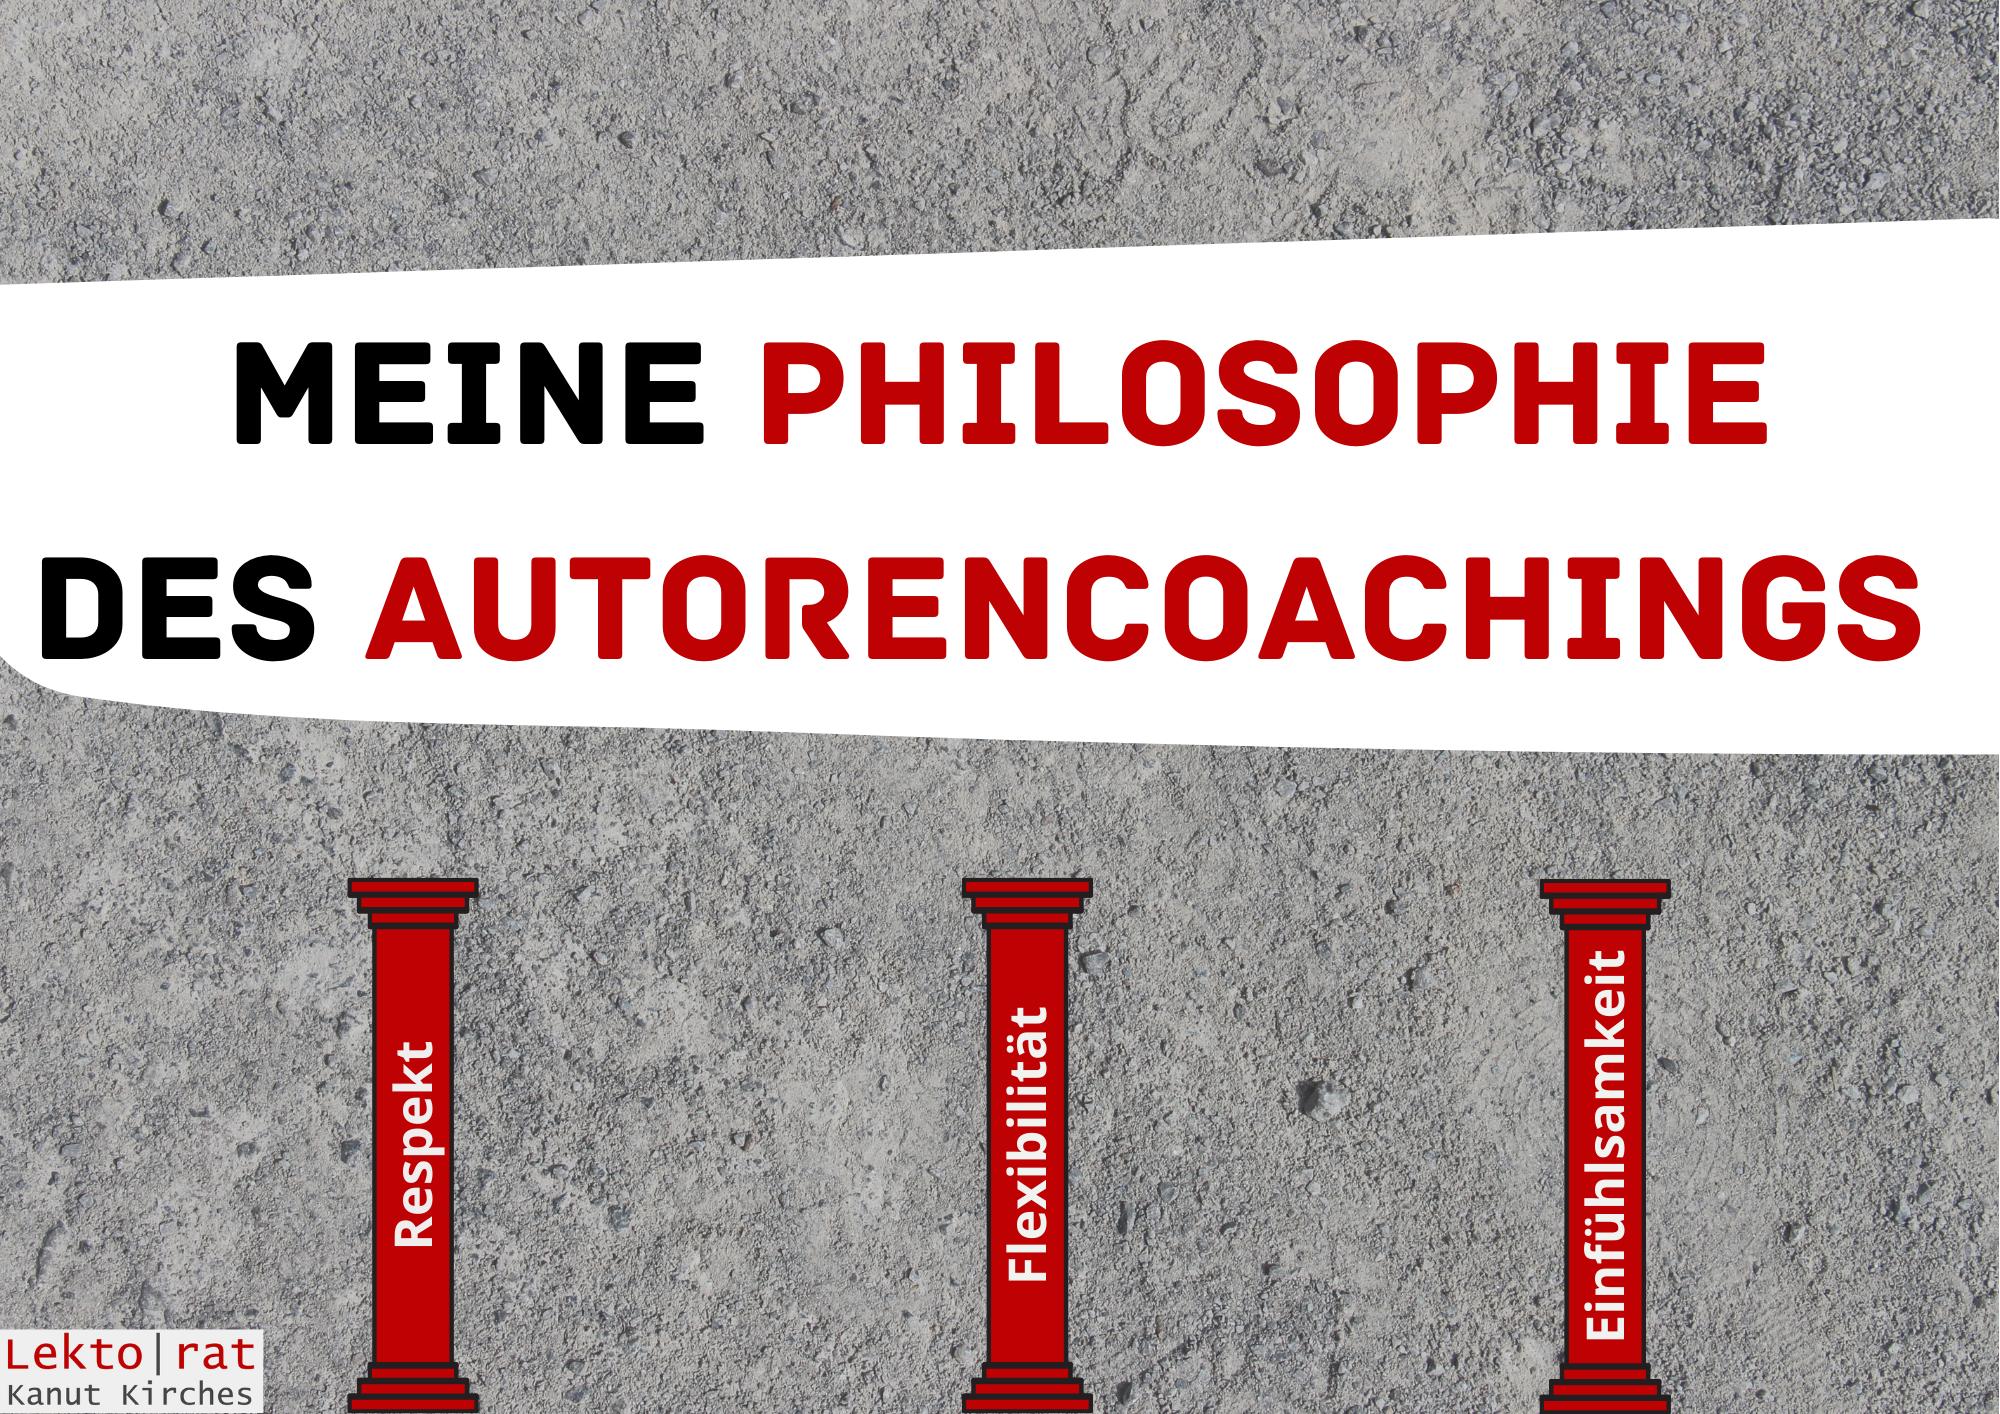 Meine Philosophie des Autorencoachings